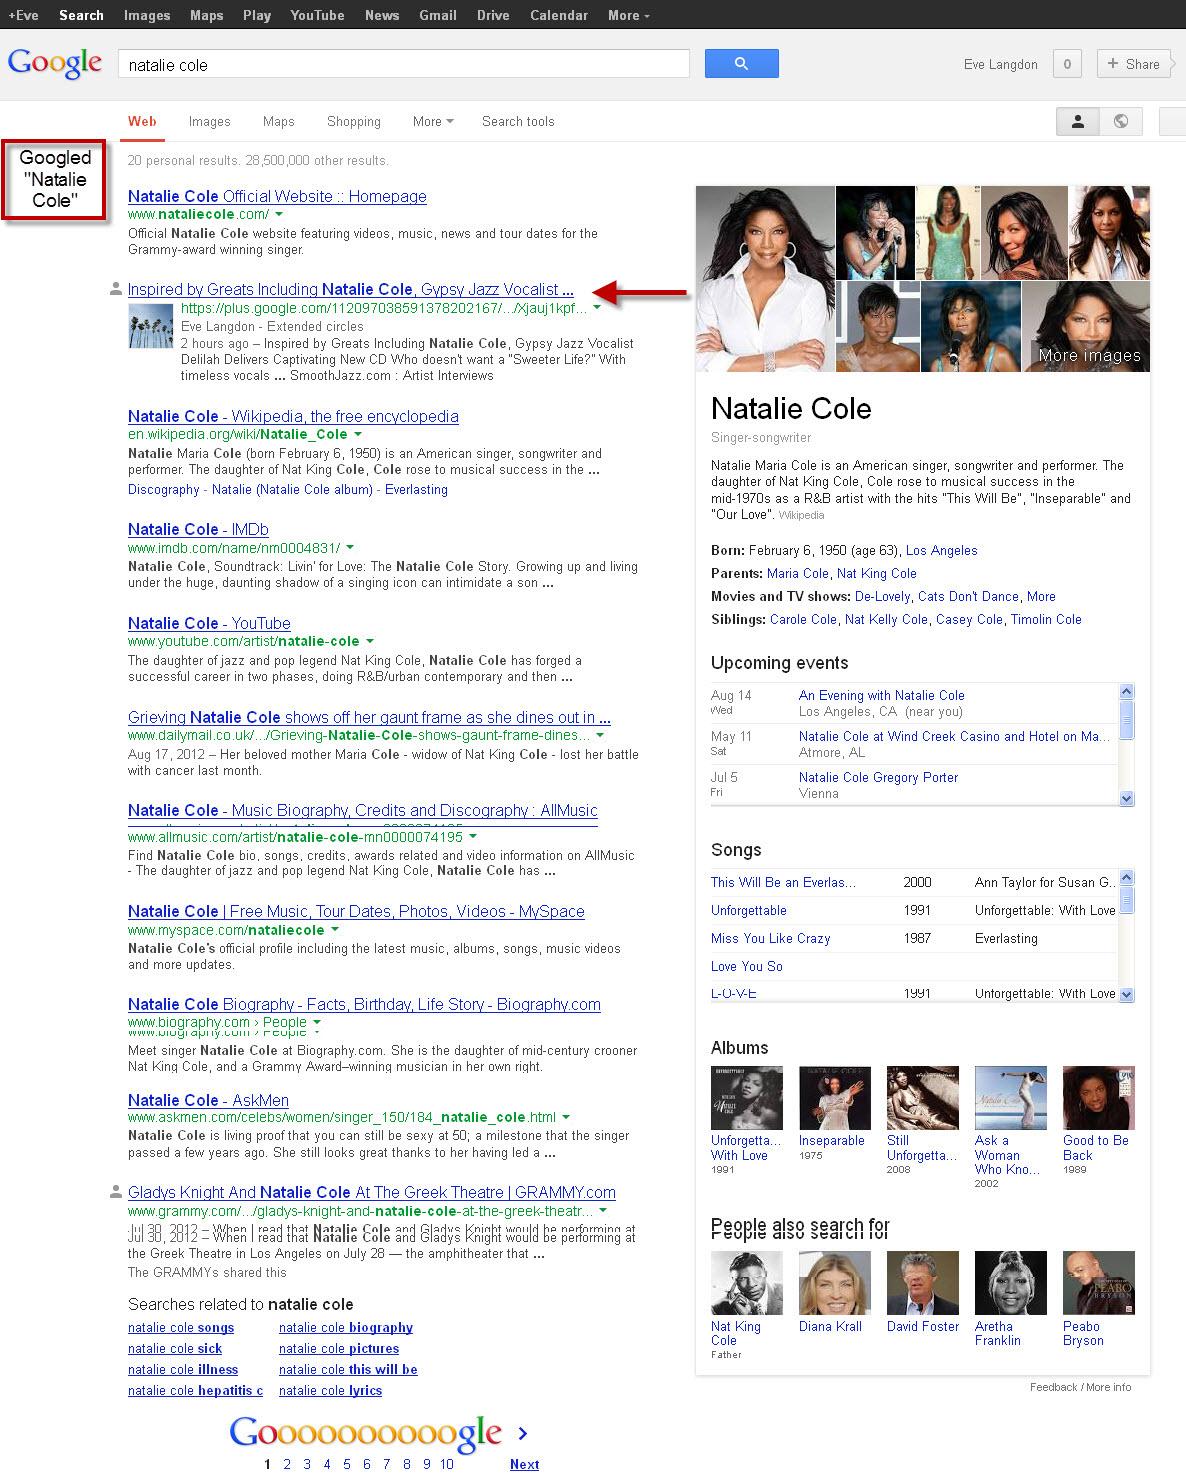 Natalie Cole PR #2 out of 28,776,000